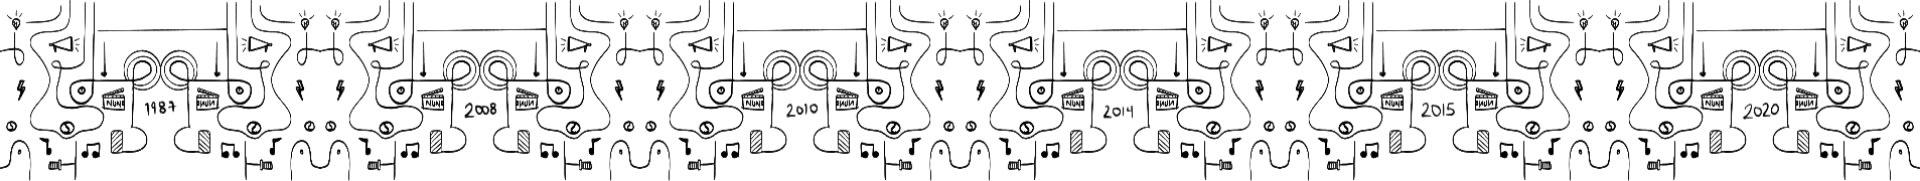 Foote pattern